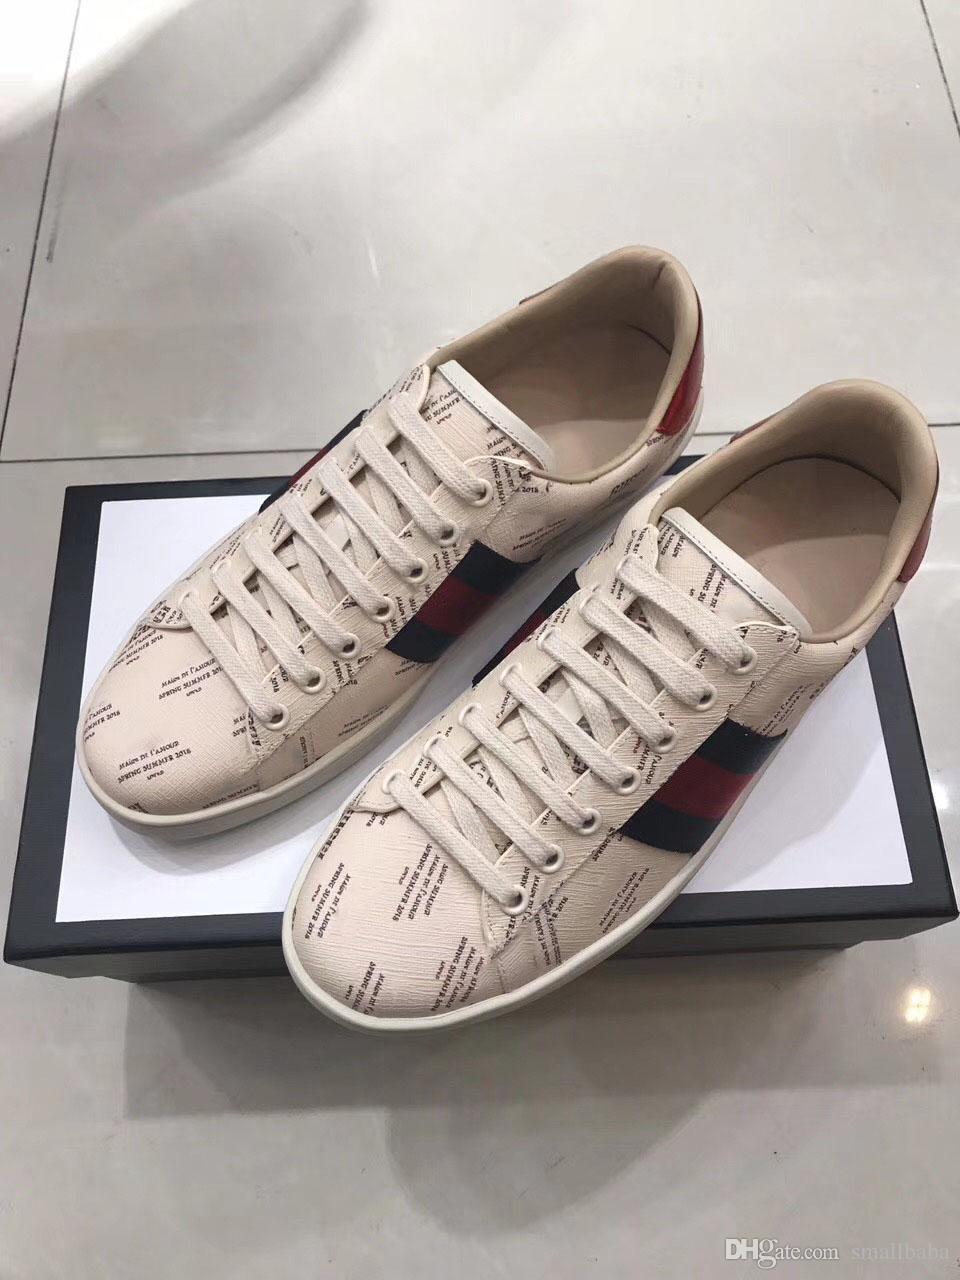 c8ee1ace6ac4 Fashion Brand Shoes Designer Men Women Sneaker Casual Shoes Top ...